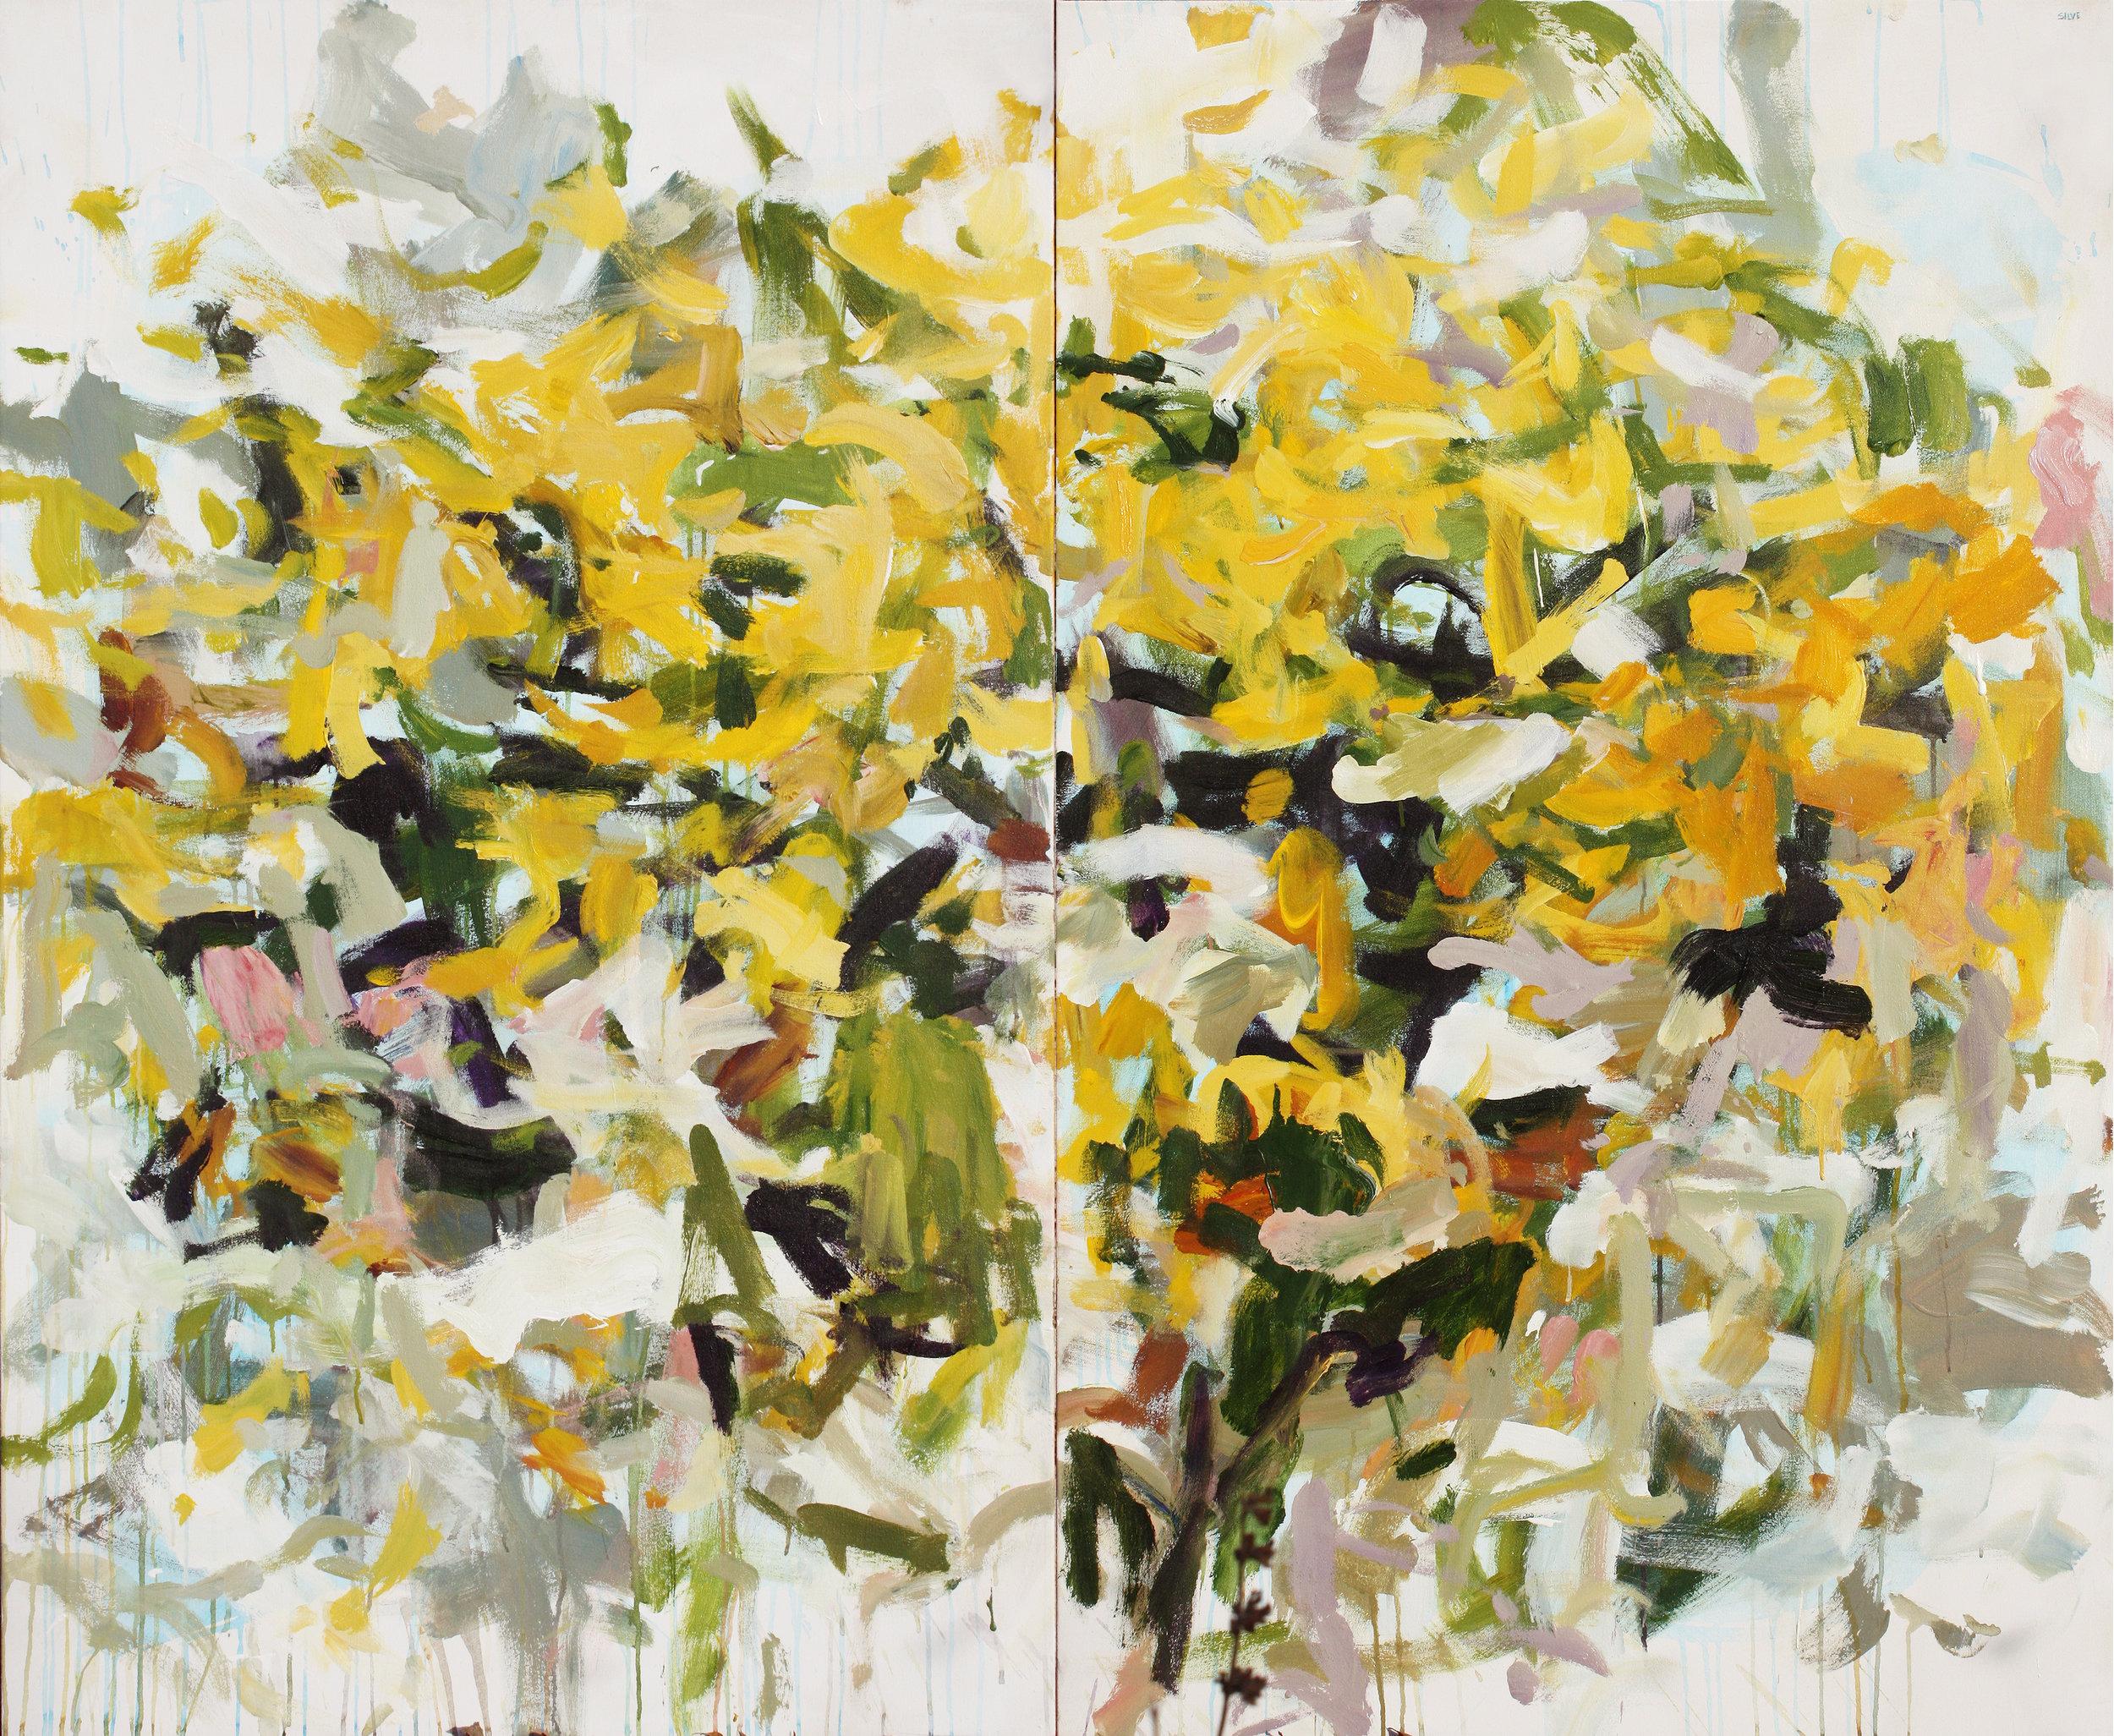 16-karen-silve-golden-moment-60x72.jpg